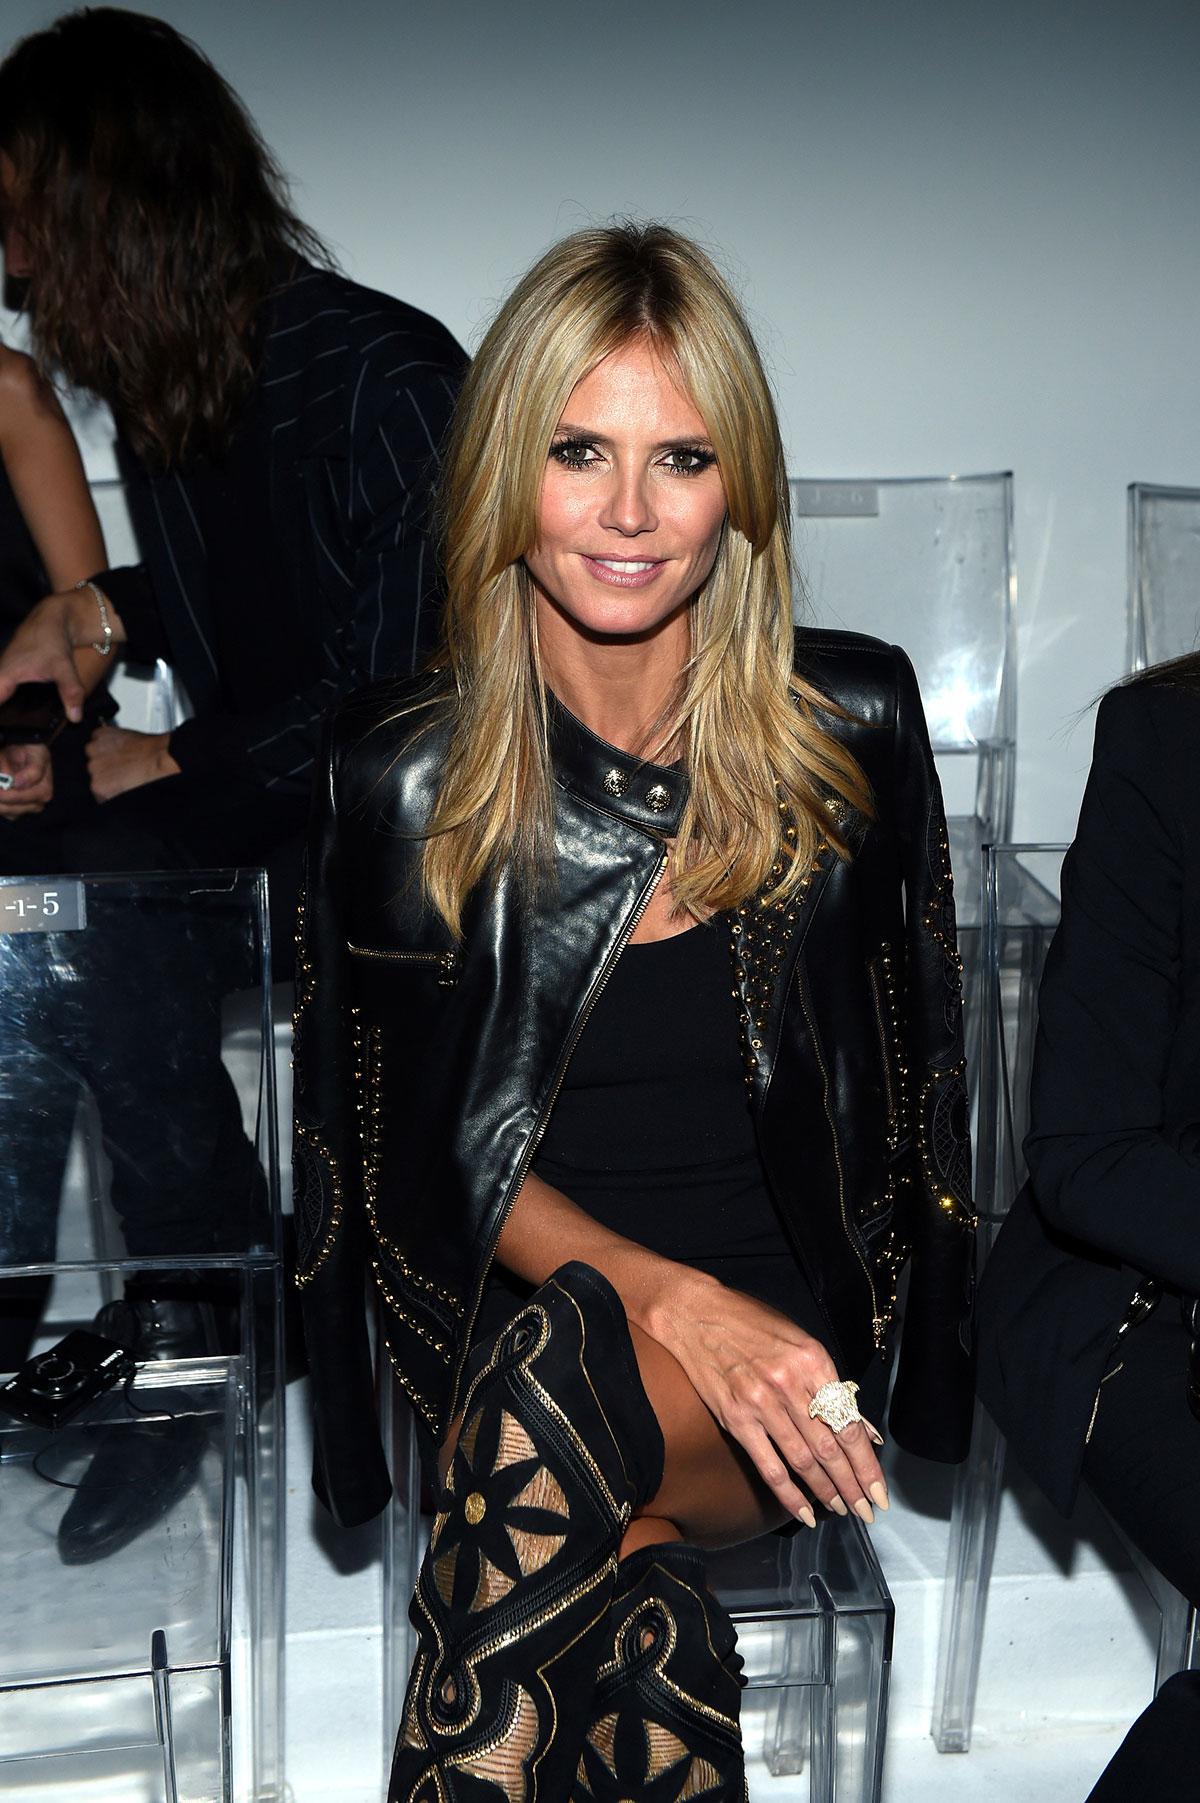 Heidi Klum attends Versace show during Milan Fashion Week